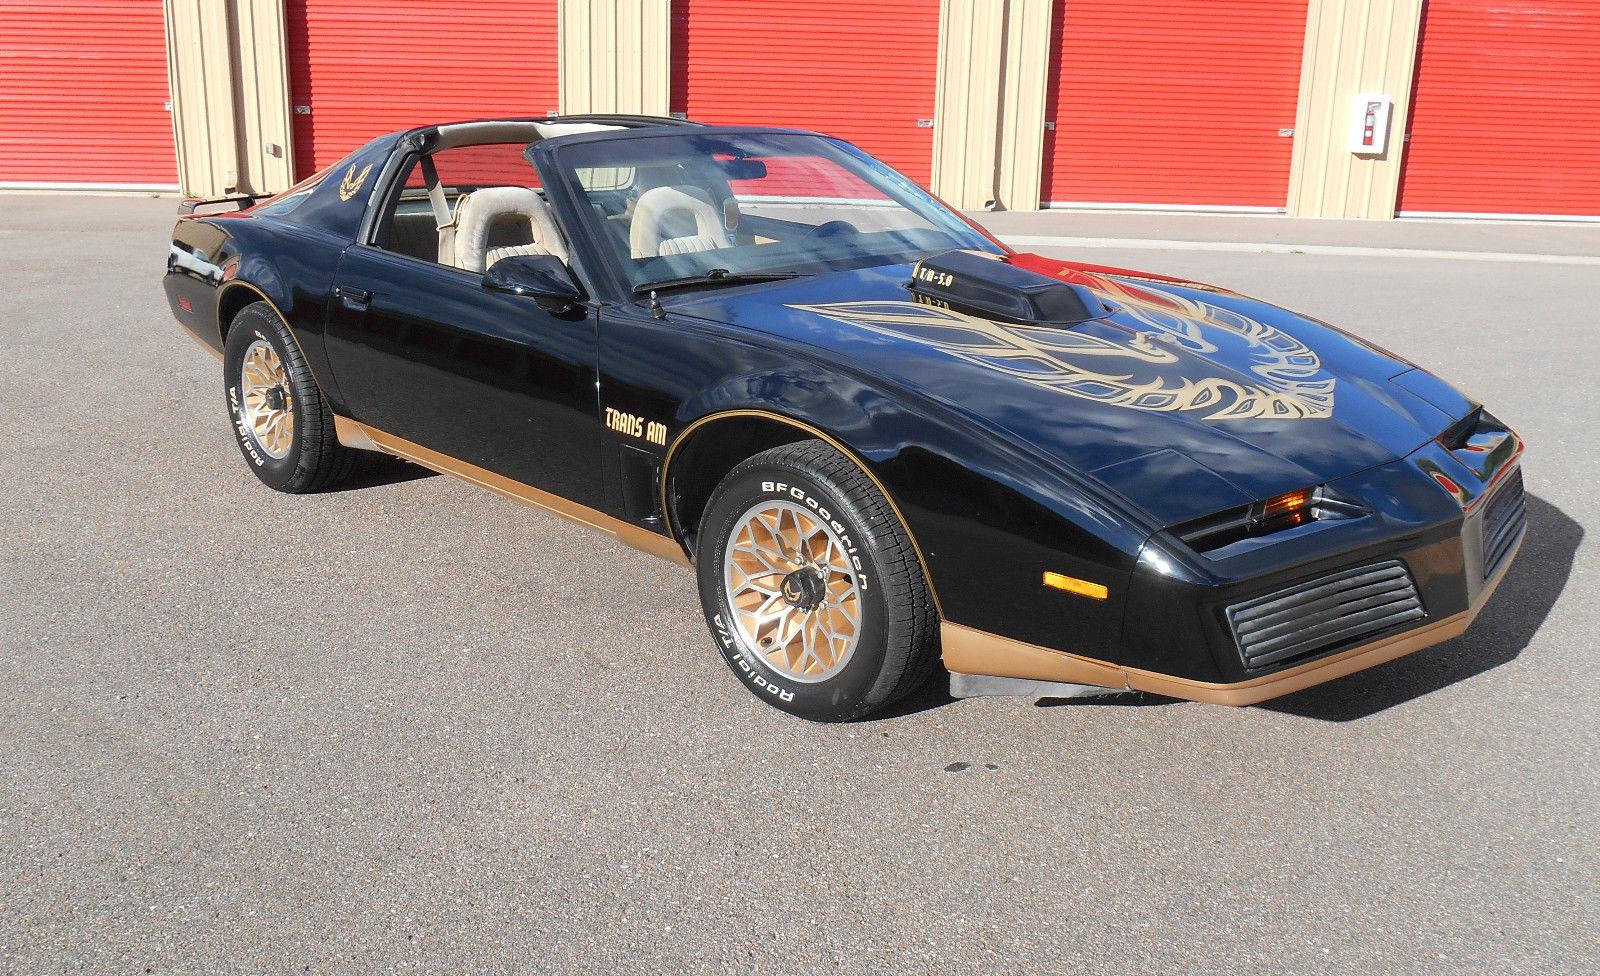 1982 pontiac firebird trans am coupe 2 door 5 0l trans am classic pontiac firebird 1982 for sale. Black Bedroom Furniture Sets. Home Design Ideas